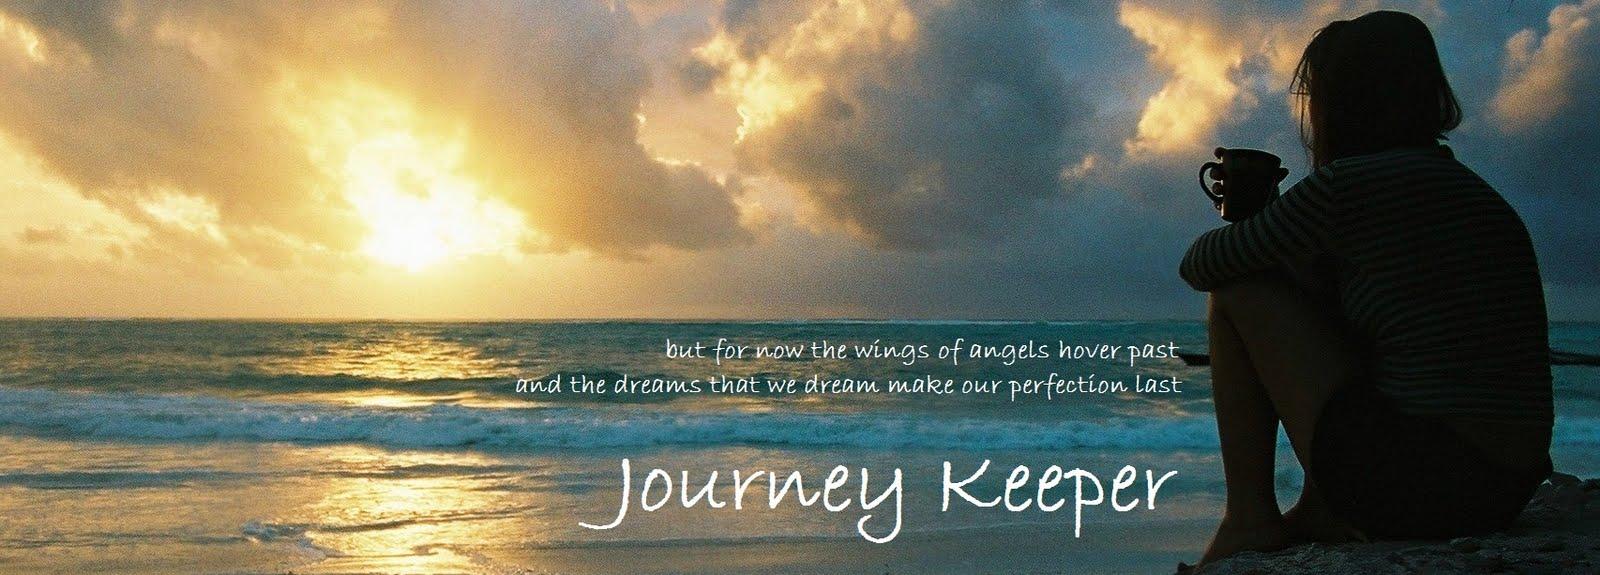 Journey Keeper